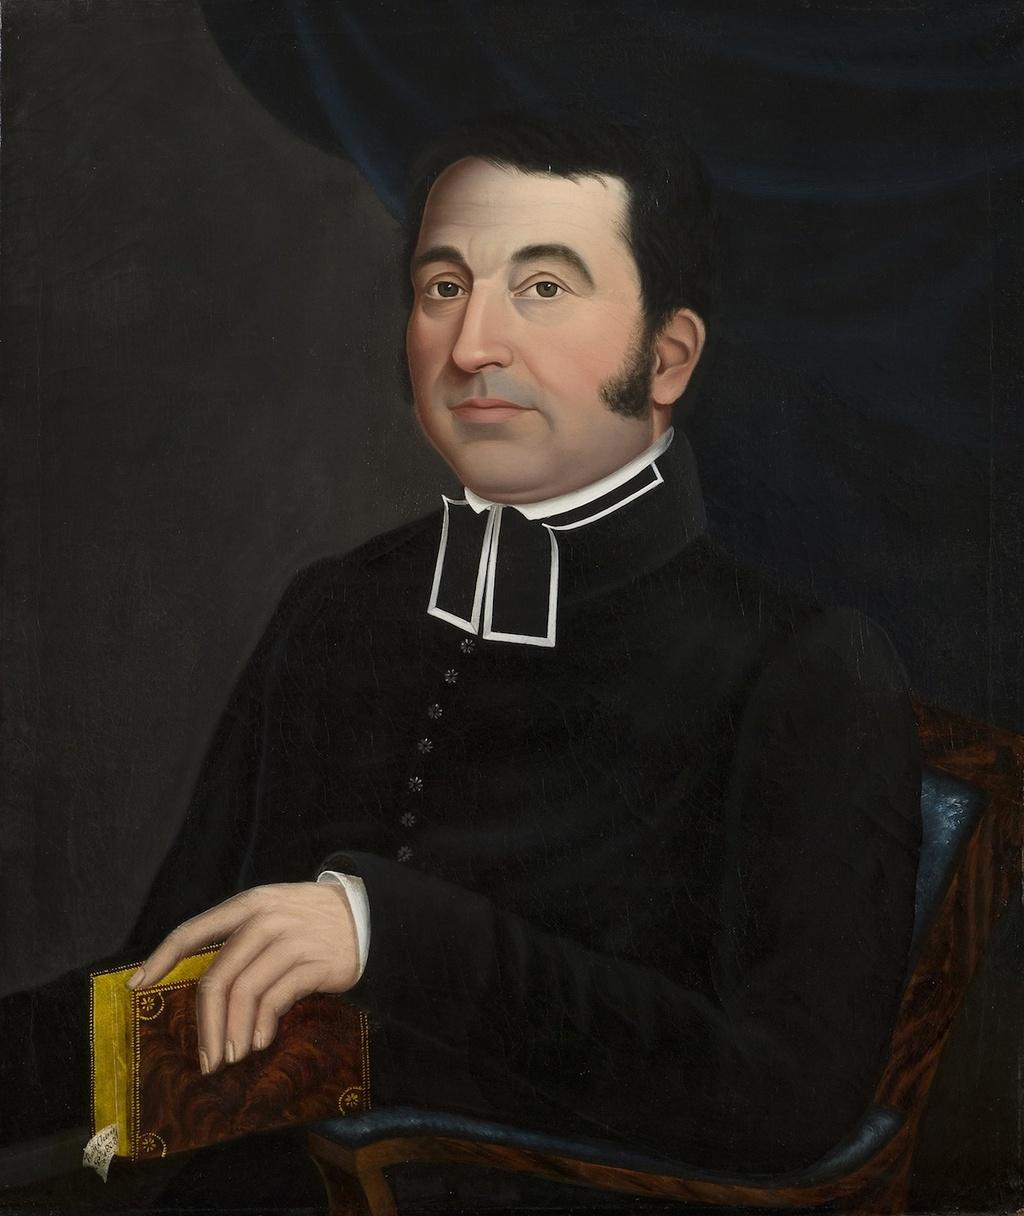 L'Abbé François-Norbert Blanchet